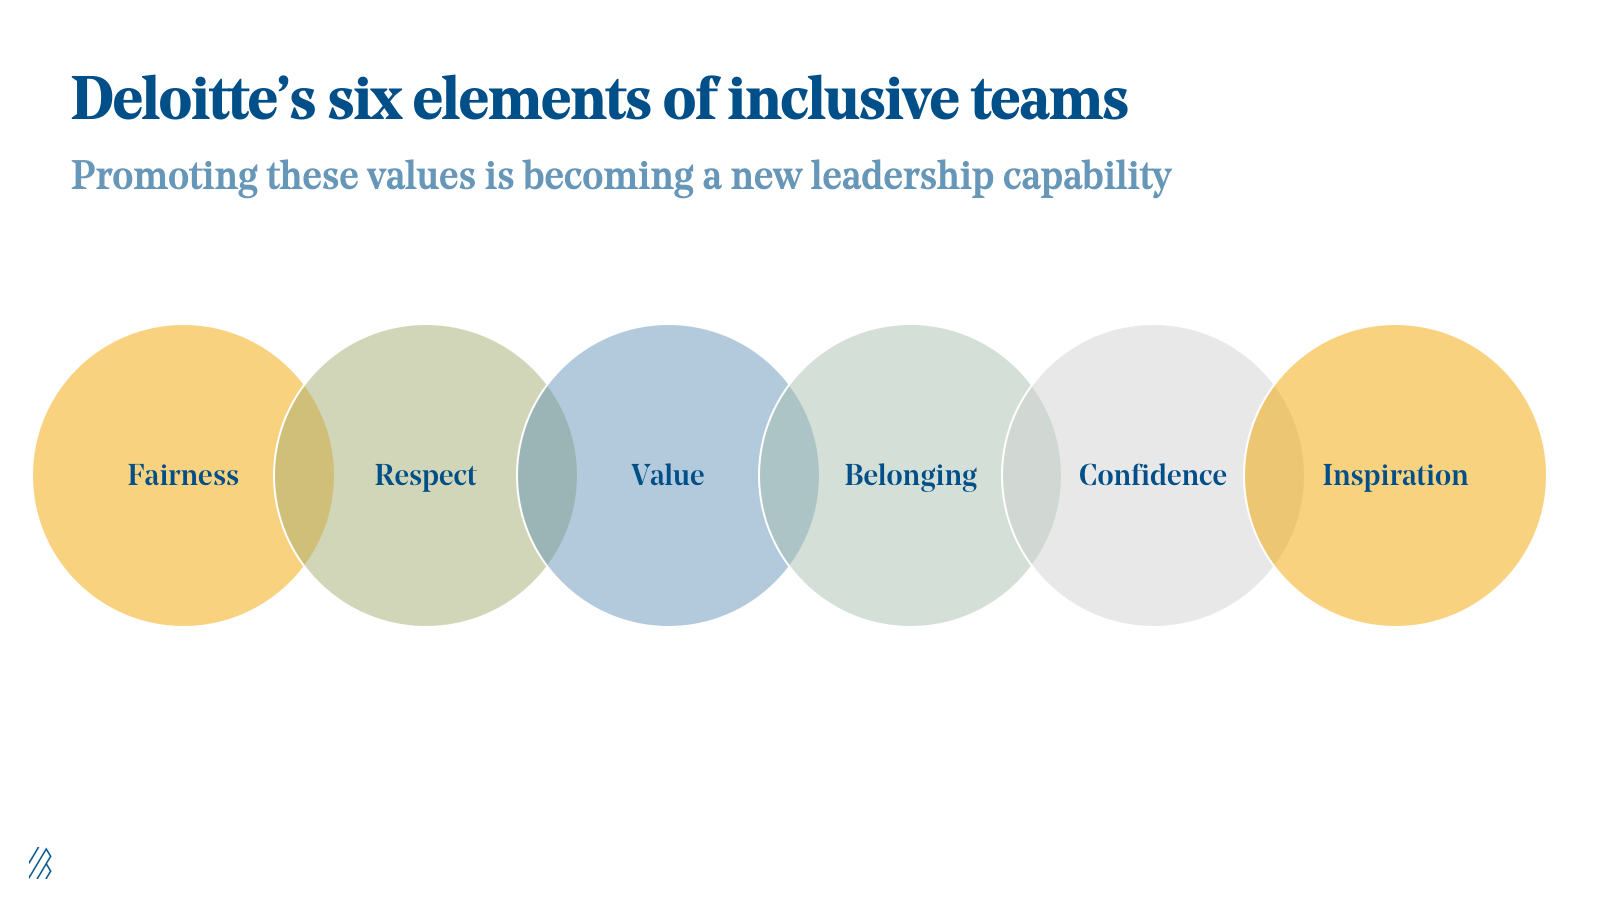 Deloitte's six elements of inclusive teams